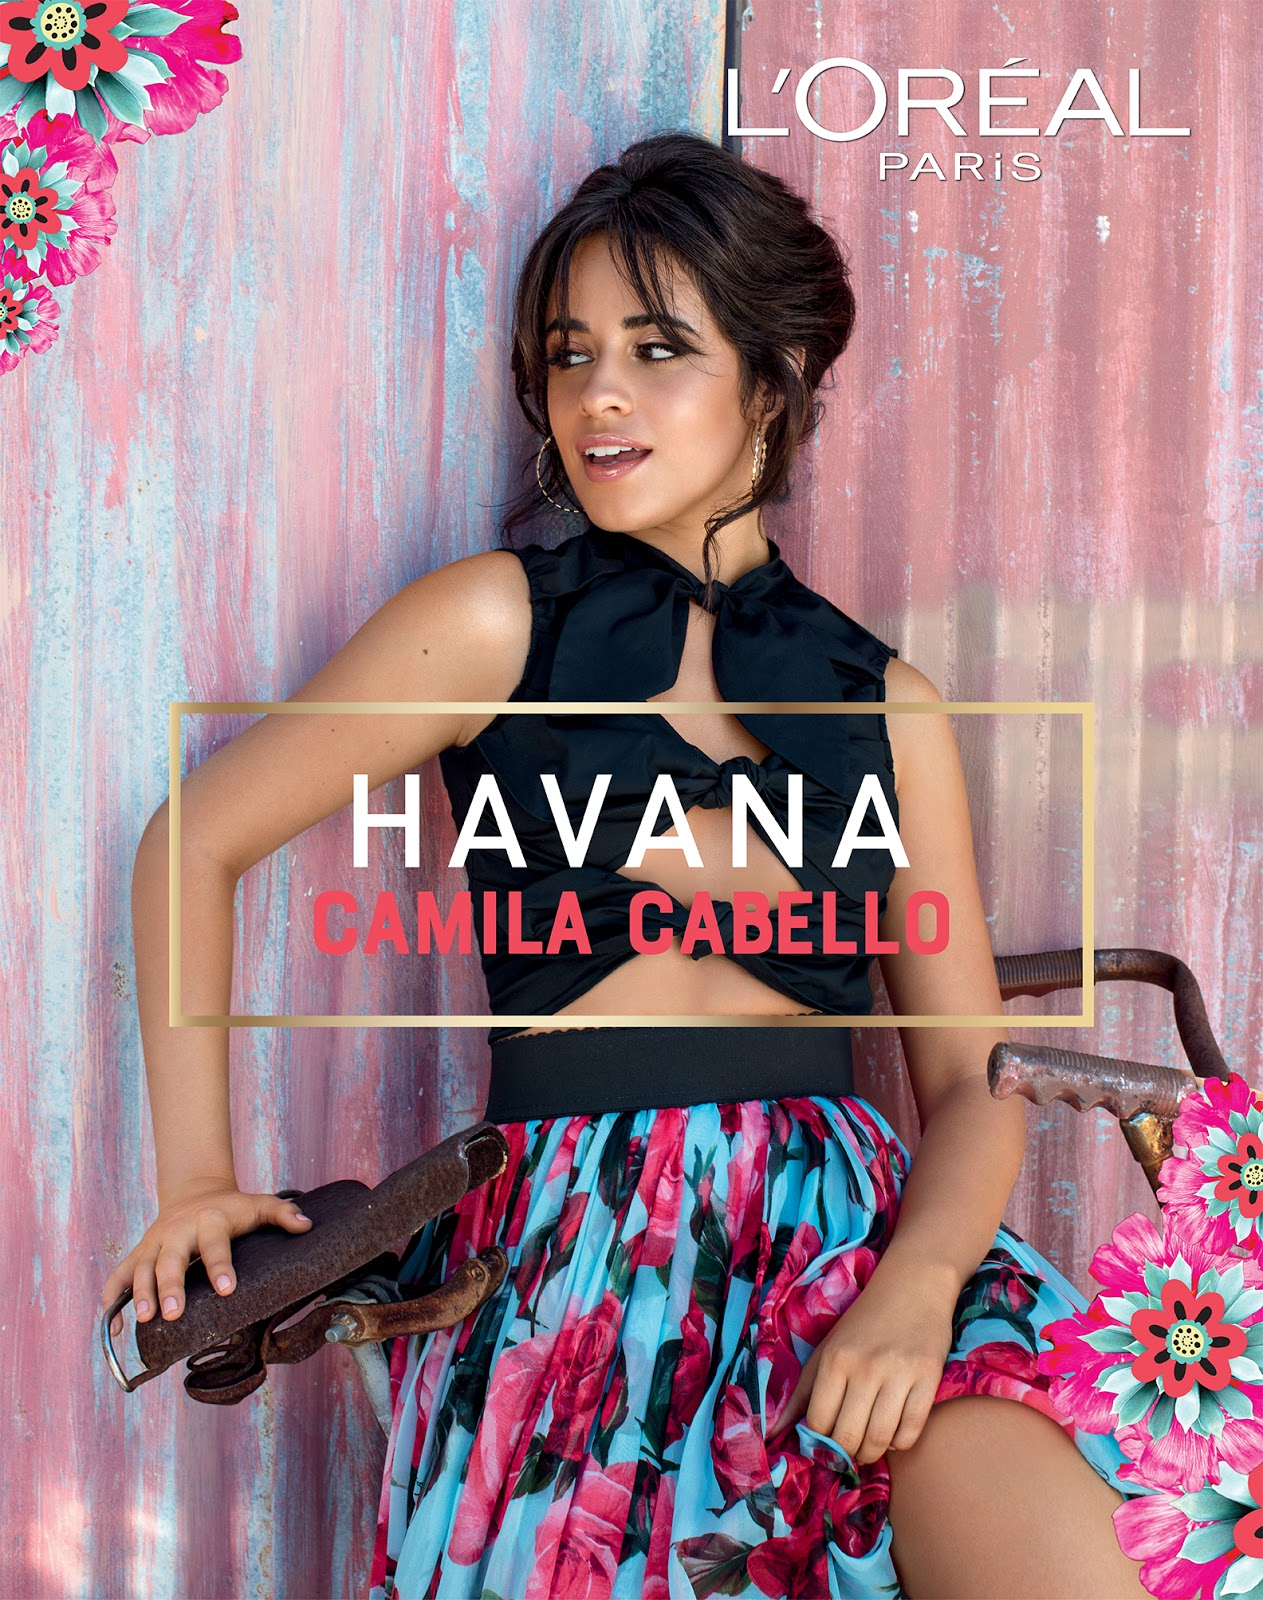 L'Óreal x Camila Cabello Havana